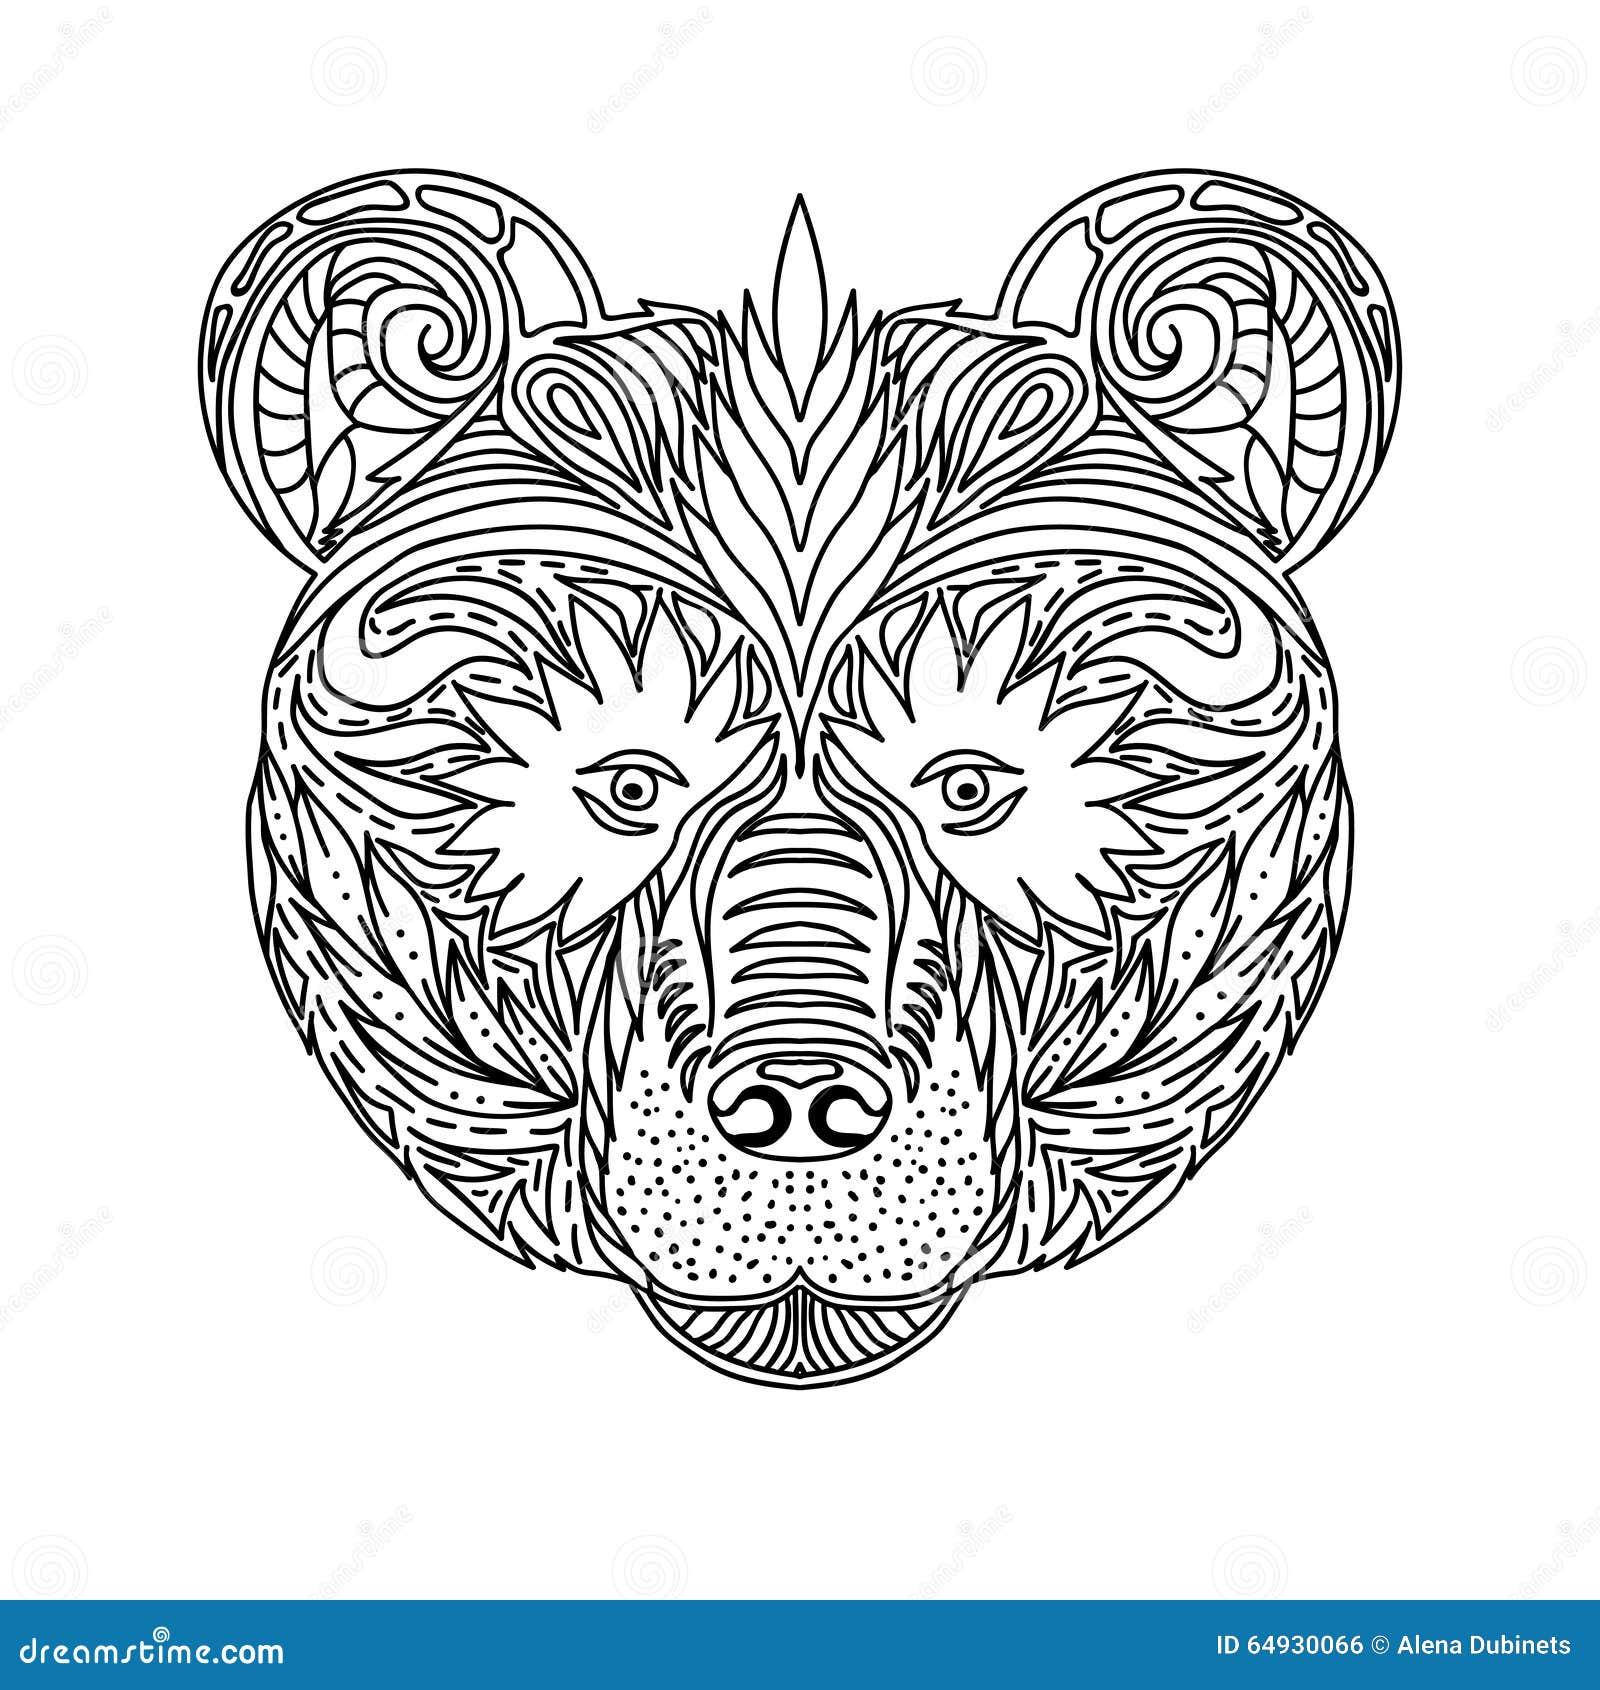 Kleurplaten Dieren Volwassenen Uil Black And White Ornament Faces Wild Beast Of The Forest